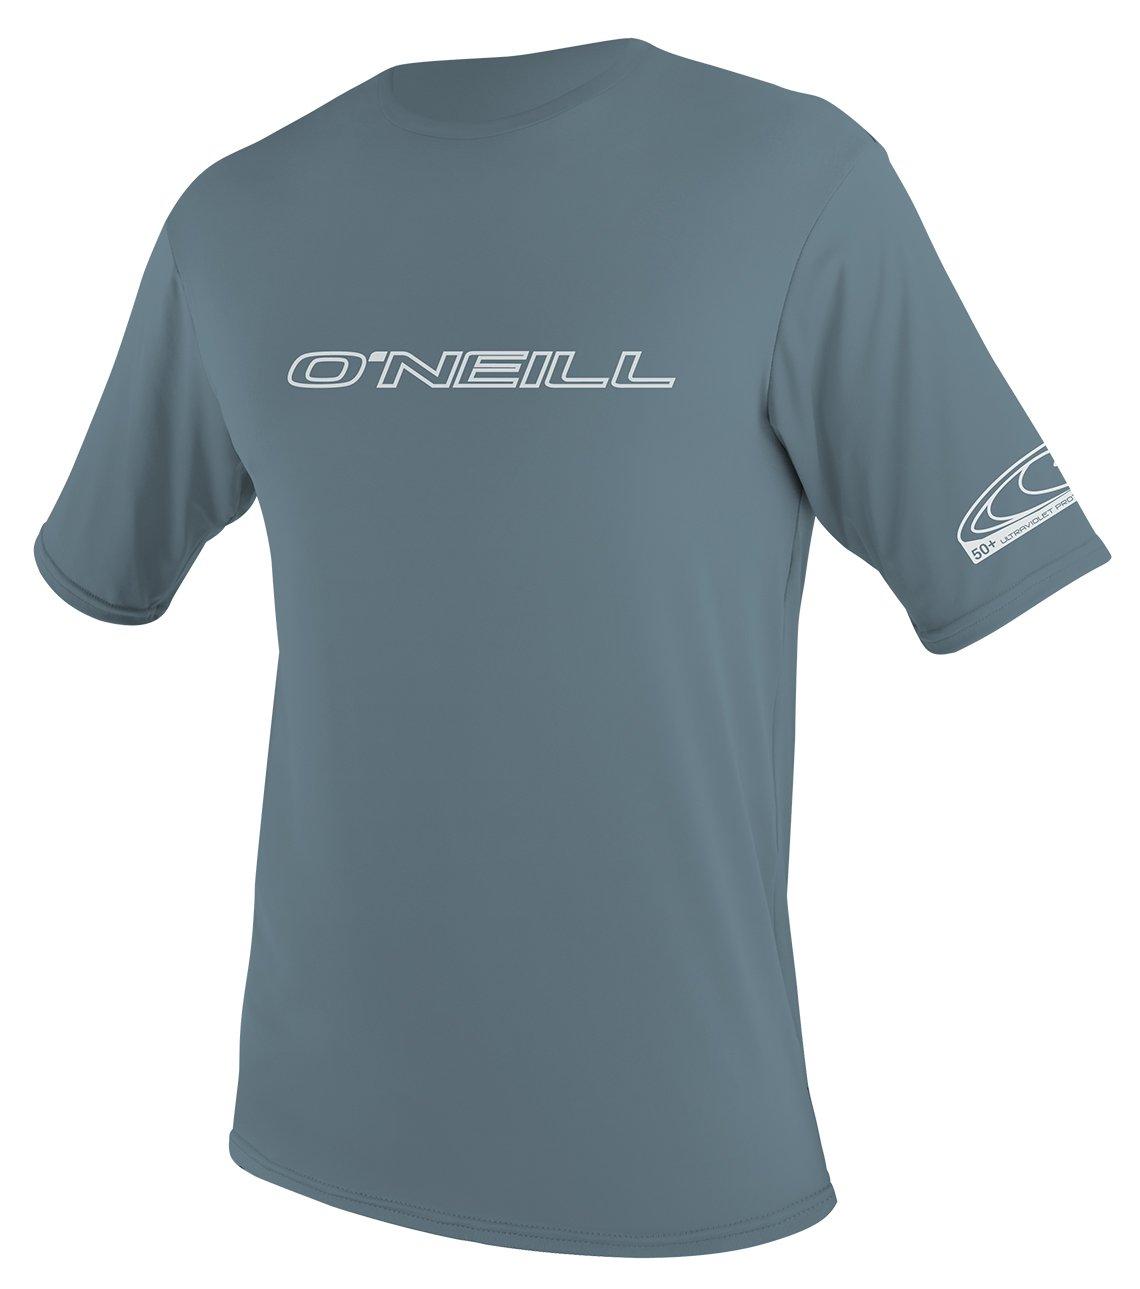 O'Neill Wetsuits Men's Basic Skins UPF 50+ Short Sleeve Sun Shirt, Dusty Blue, Small